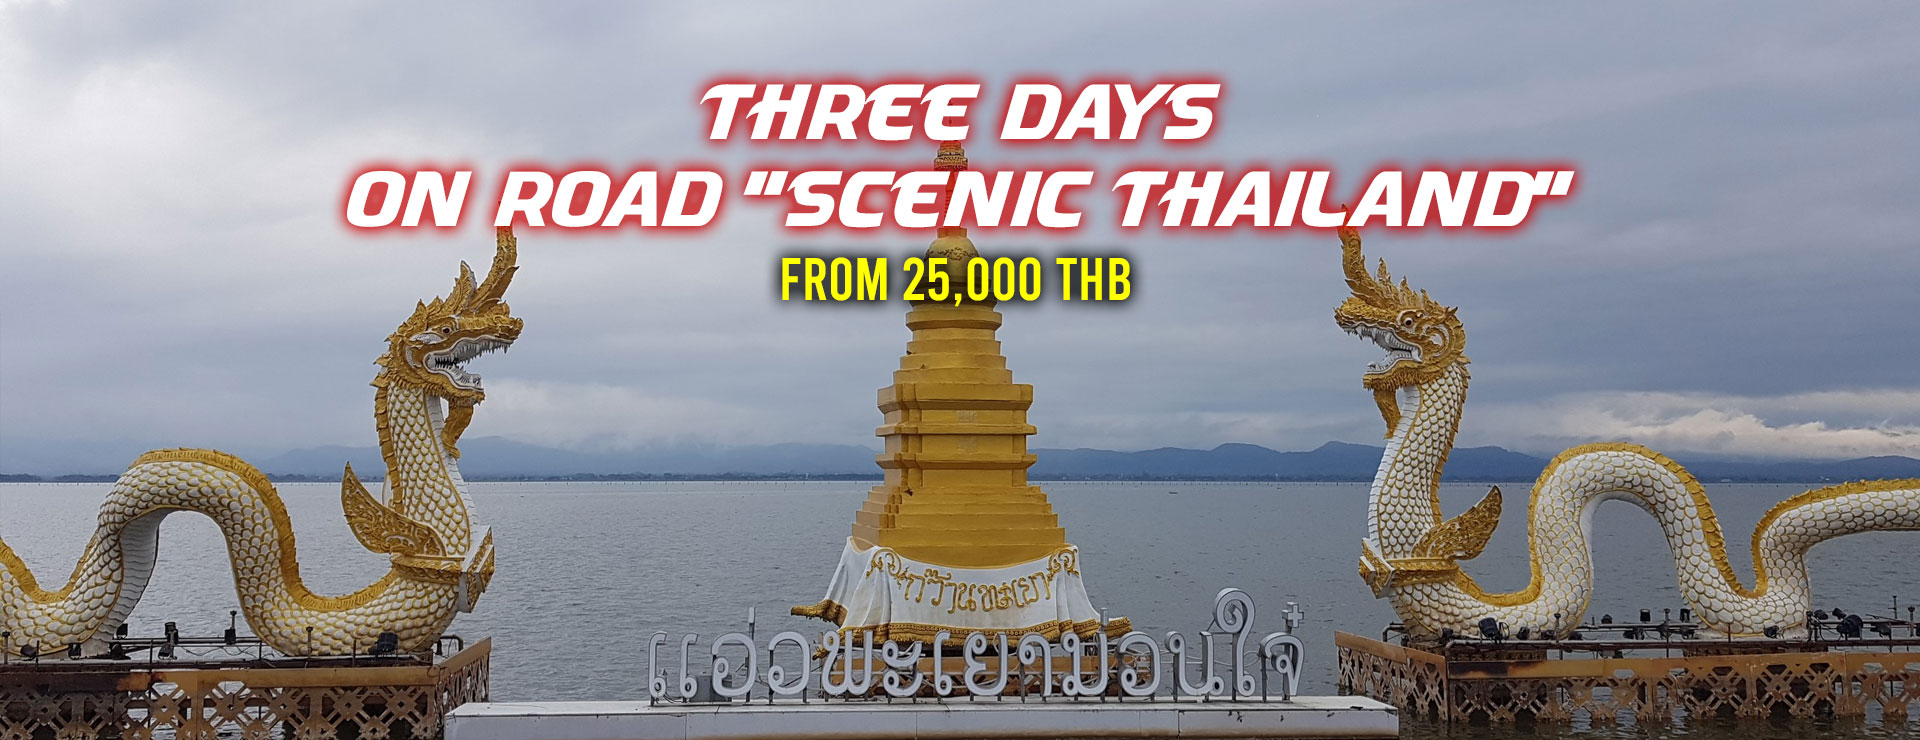 3 day scenic tour